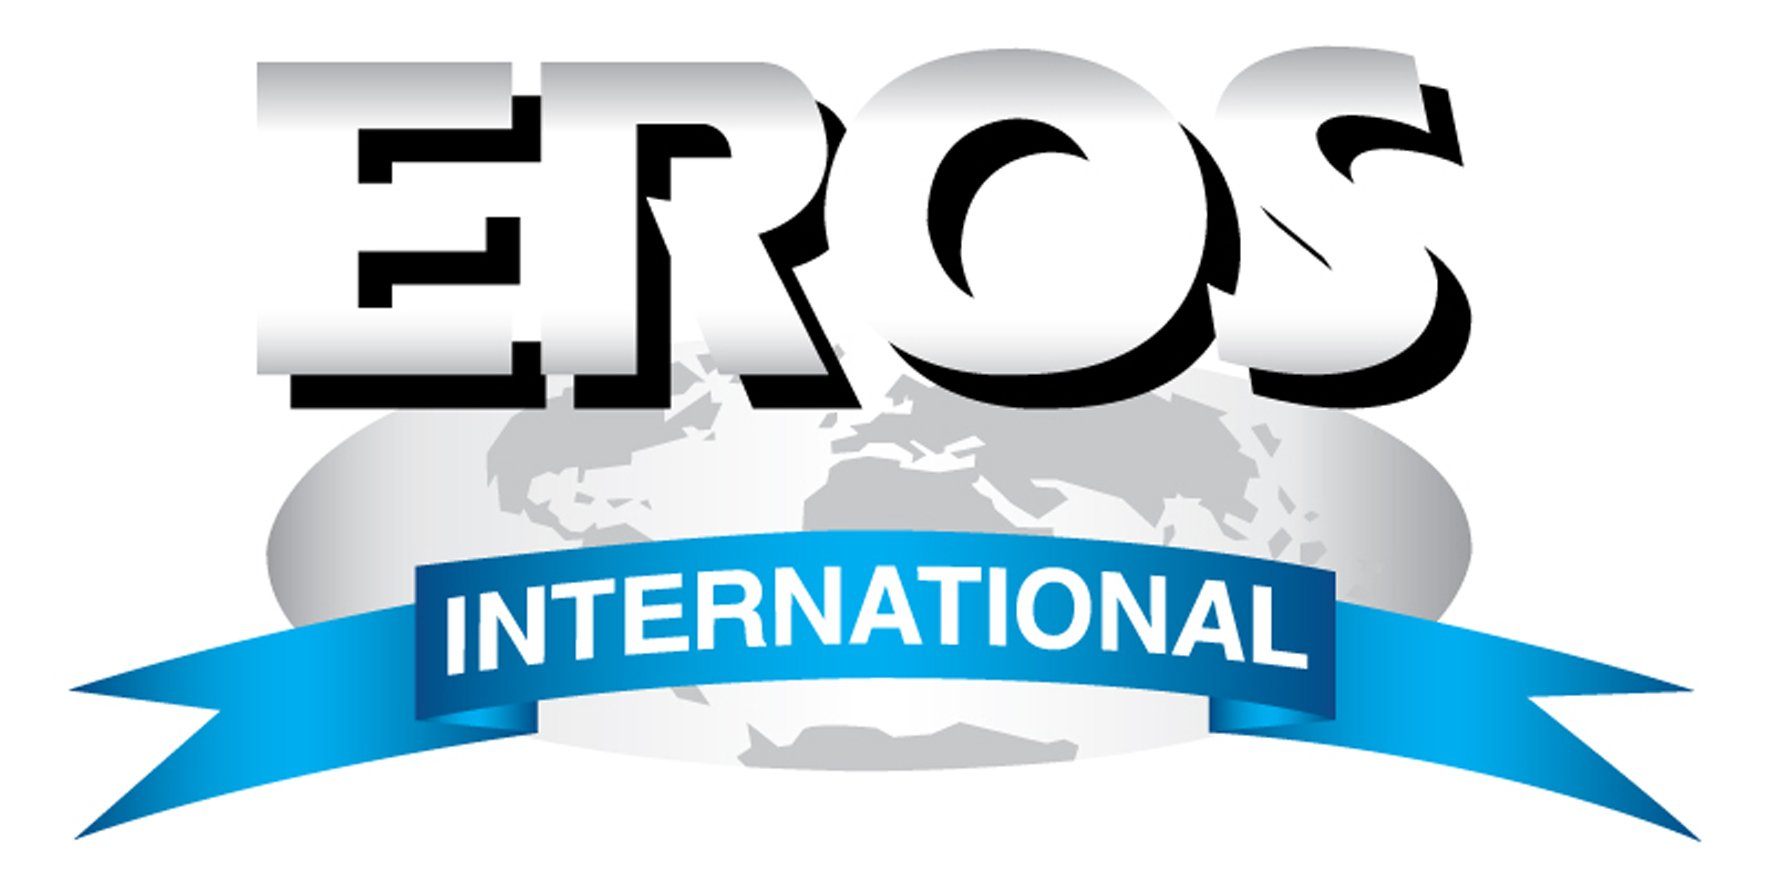 (EROS.L) logo